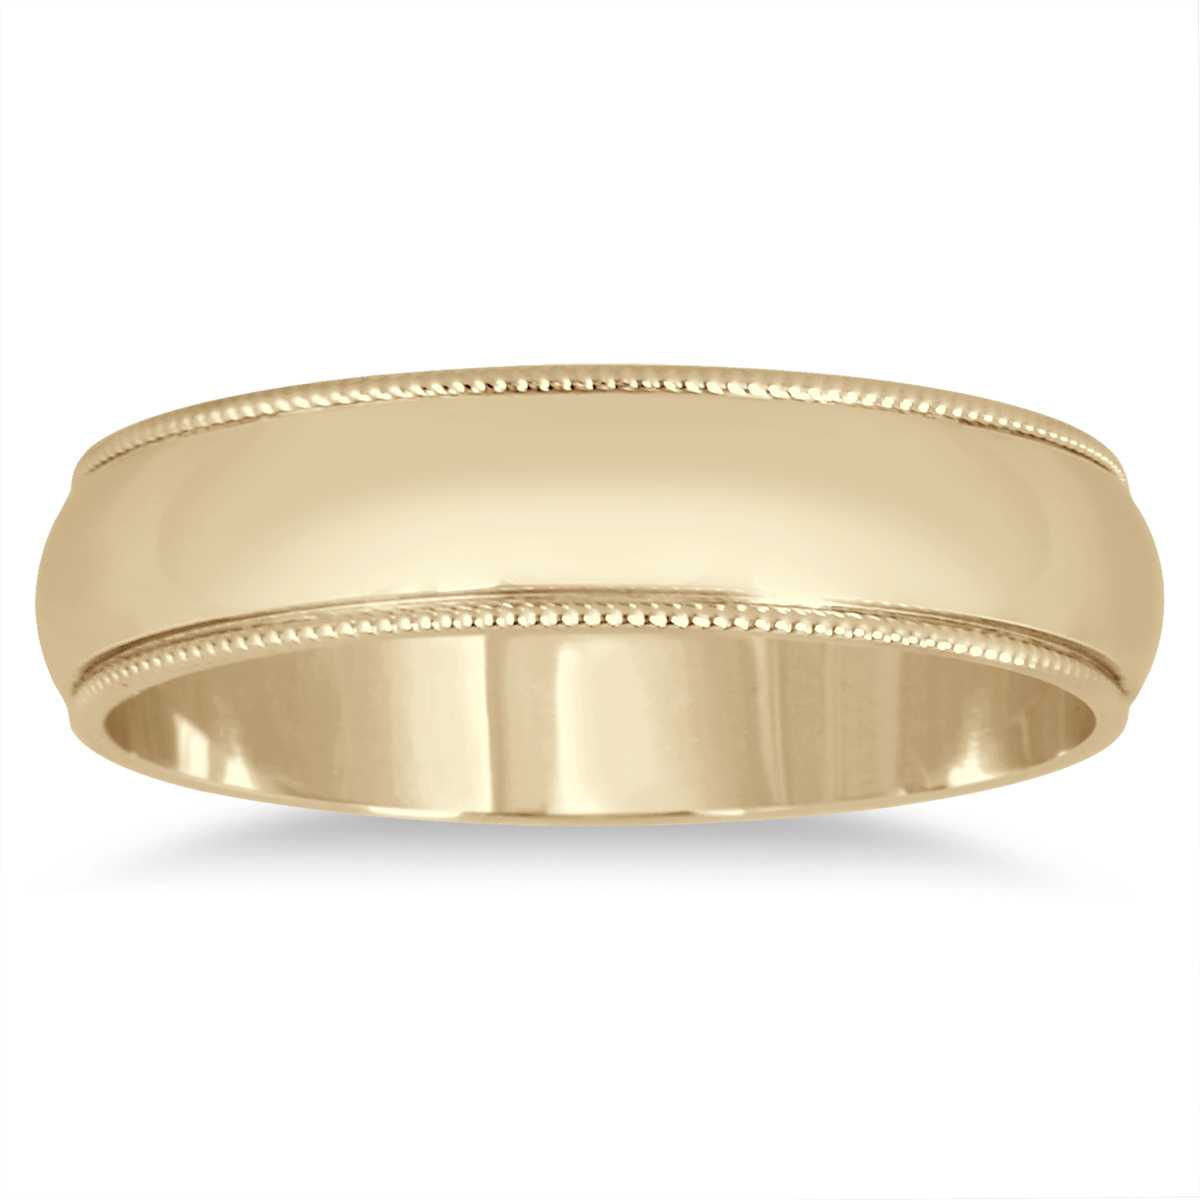 4mm Milgrain Edge Comfort Fit Wedding Band in 14K Yellow Gold